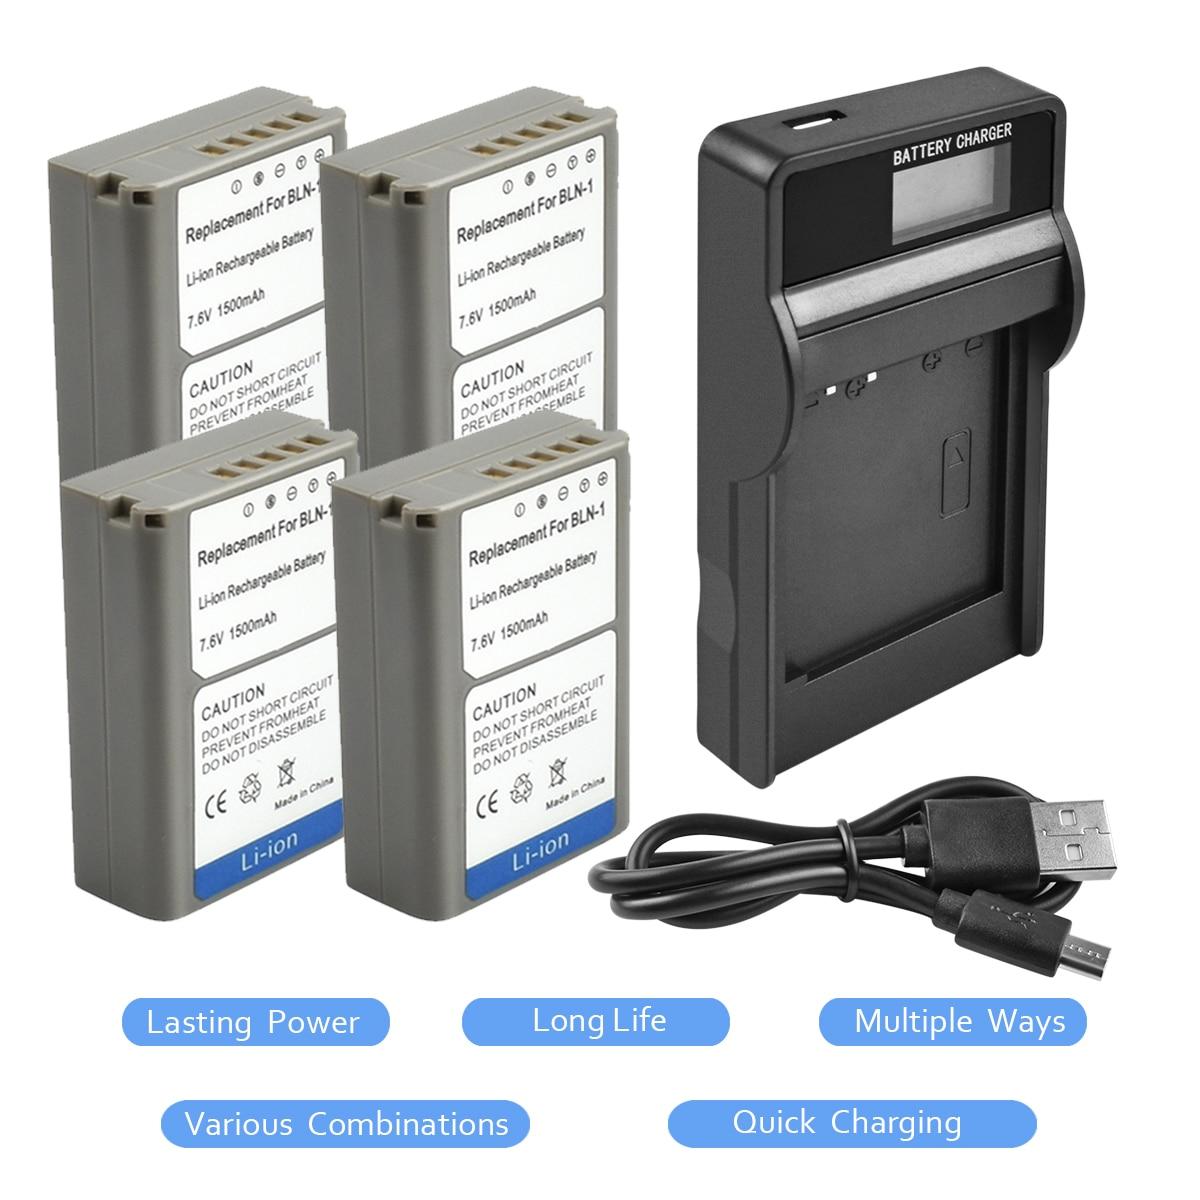 4Packs BLN-1 BLN1 PSBLN1 Battery 7.4V 1500mAh +1Port Battery charger with LED for Olympus E-M5 OM-D E-M1 E-P5 E-M5 II Camera L10 rutherfurd e russka